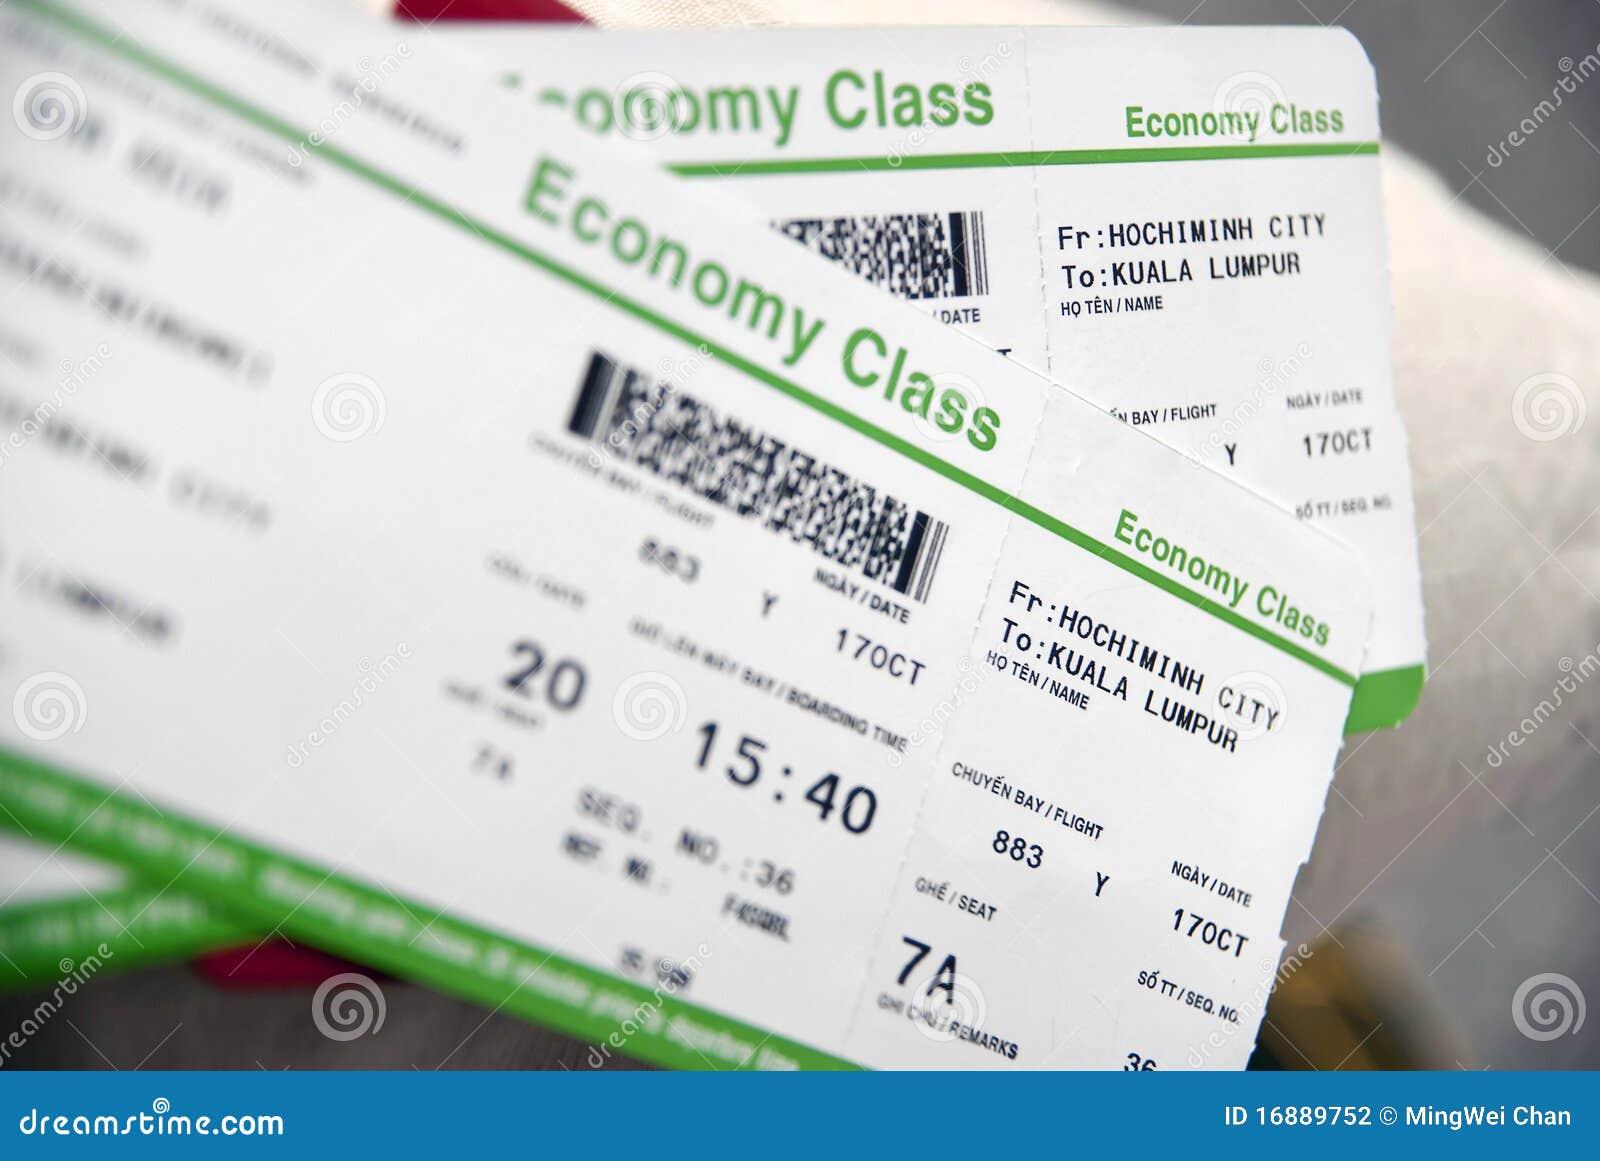 Plane Ticket Invitation was Lovely Design To Make Best Invitations Sample